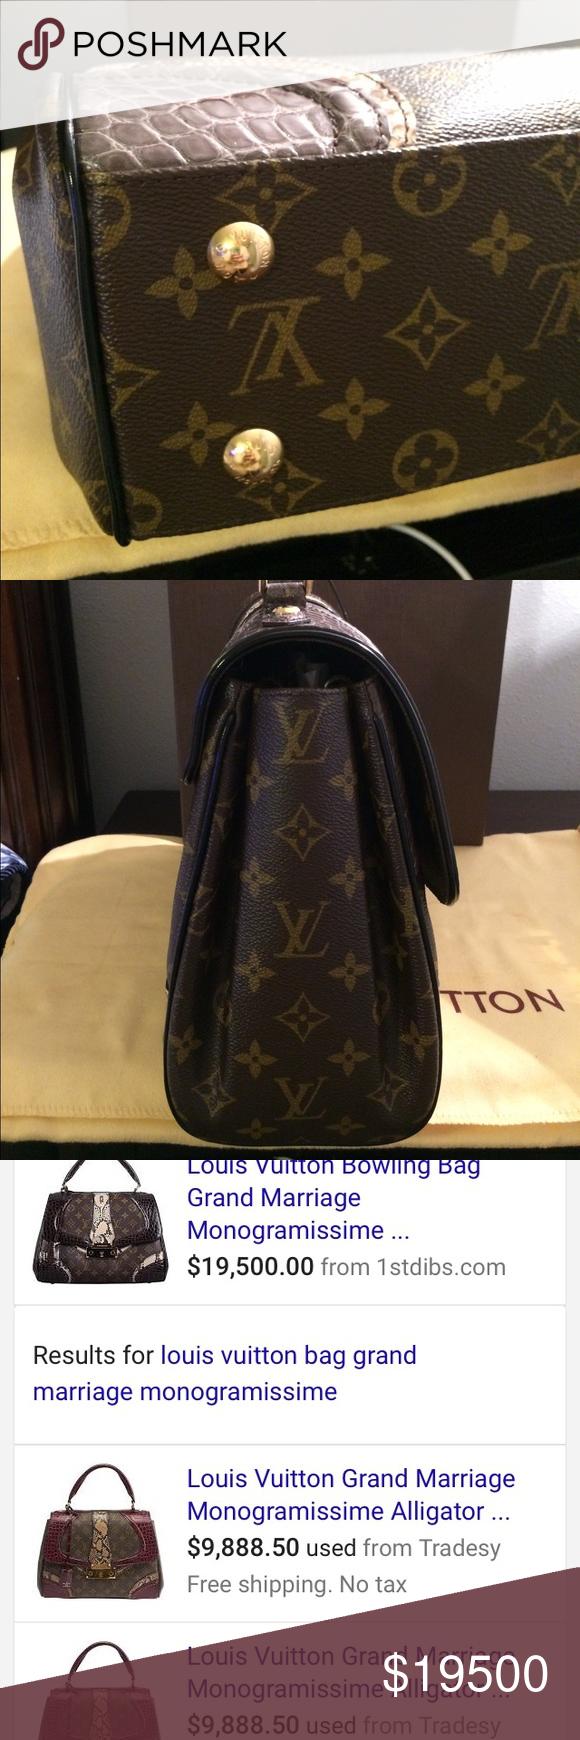 89acdc6906cf Spotted while shopping on Poshmark  RARE LOUIS VUITTON GRAND MARRIAGE BAG!   poshmark  fashion  shopping  style  Louis Vuitton  Handbags